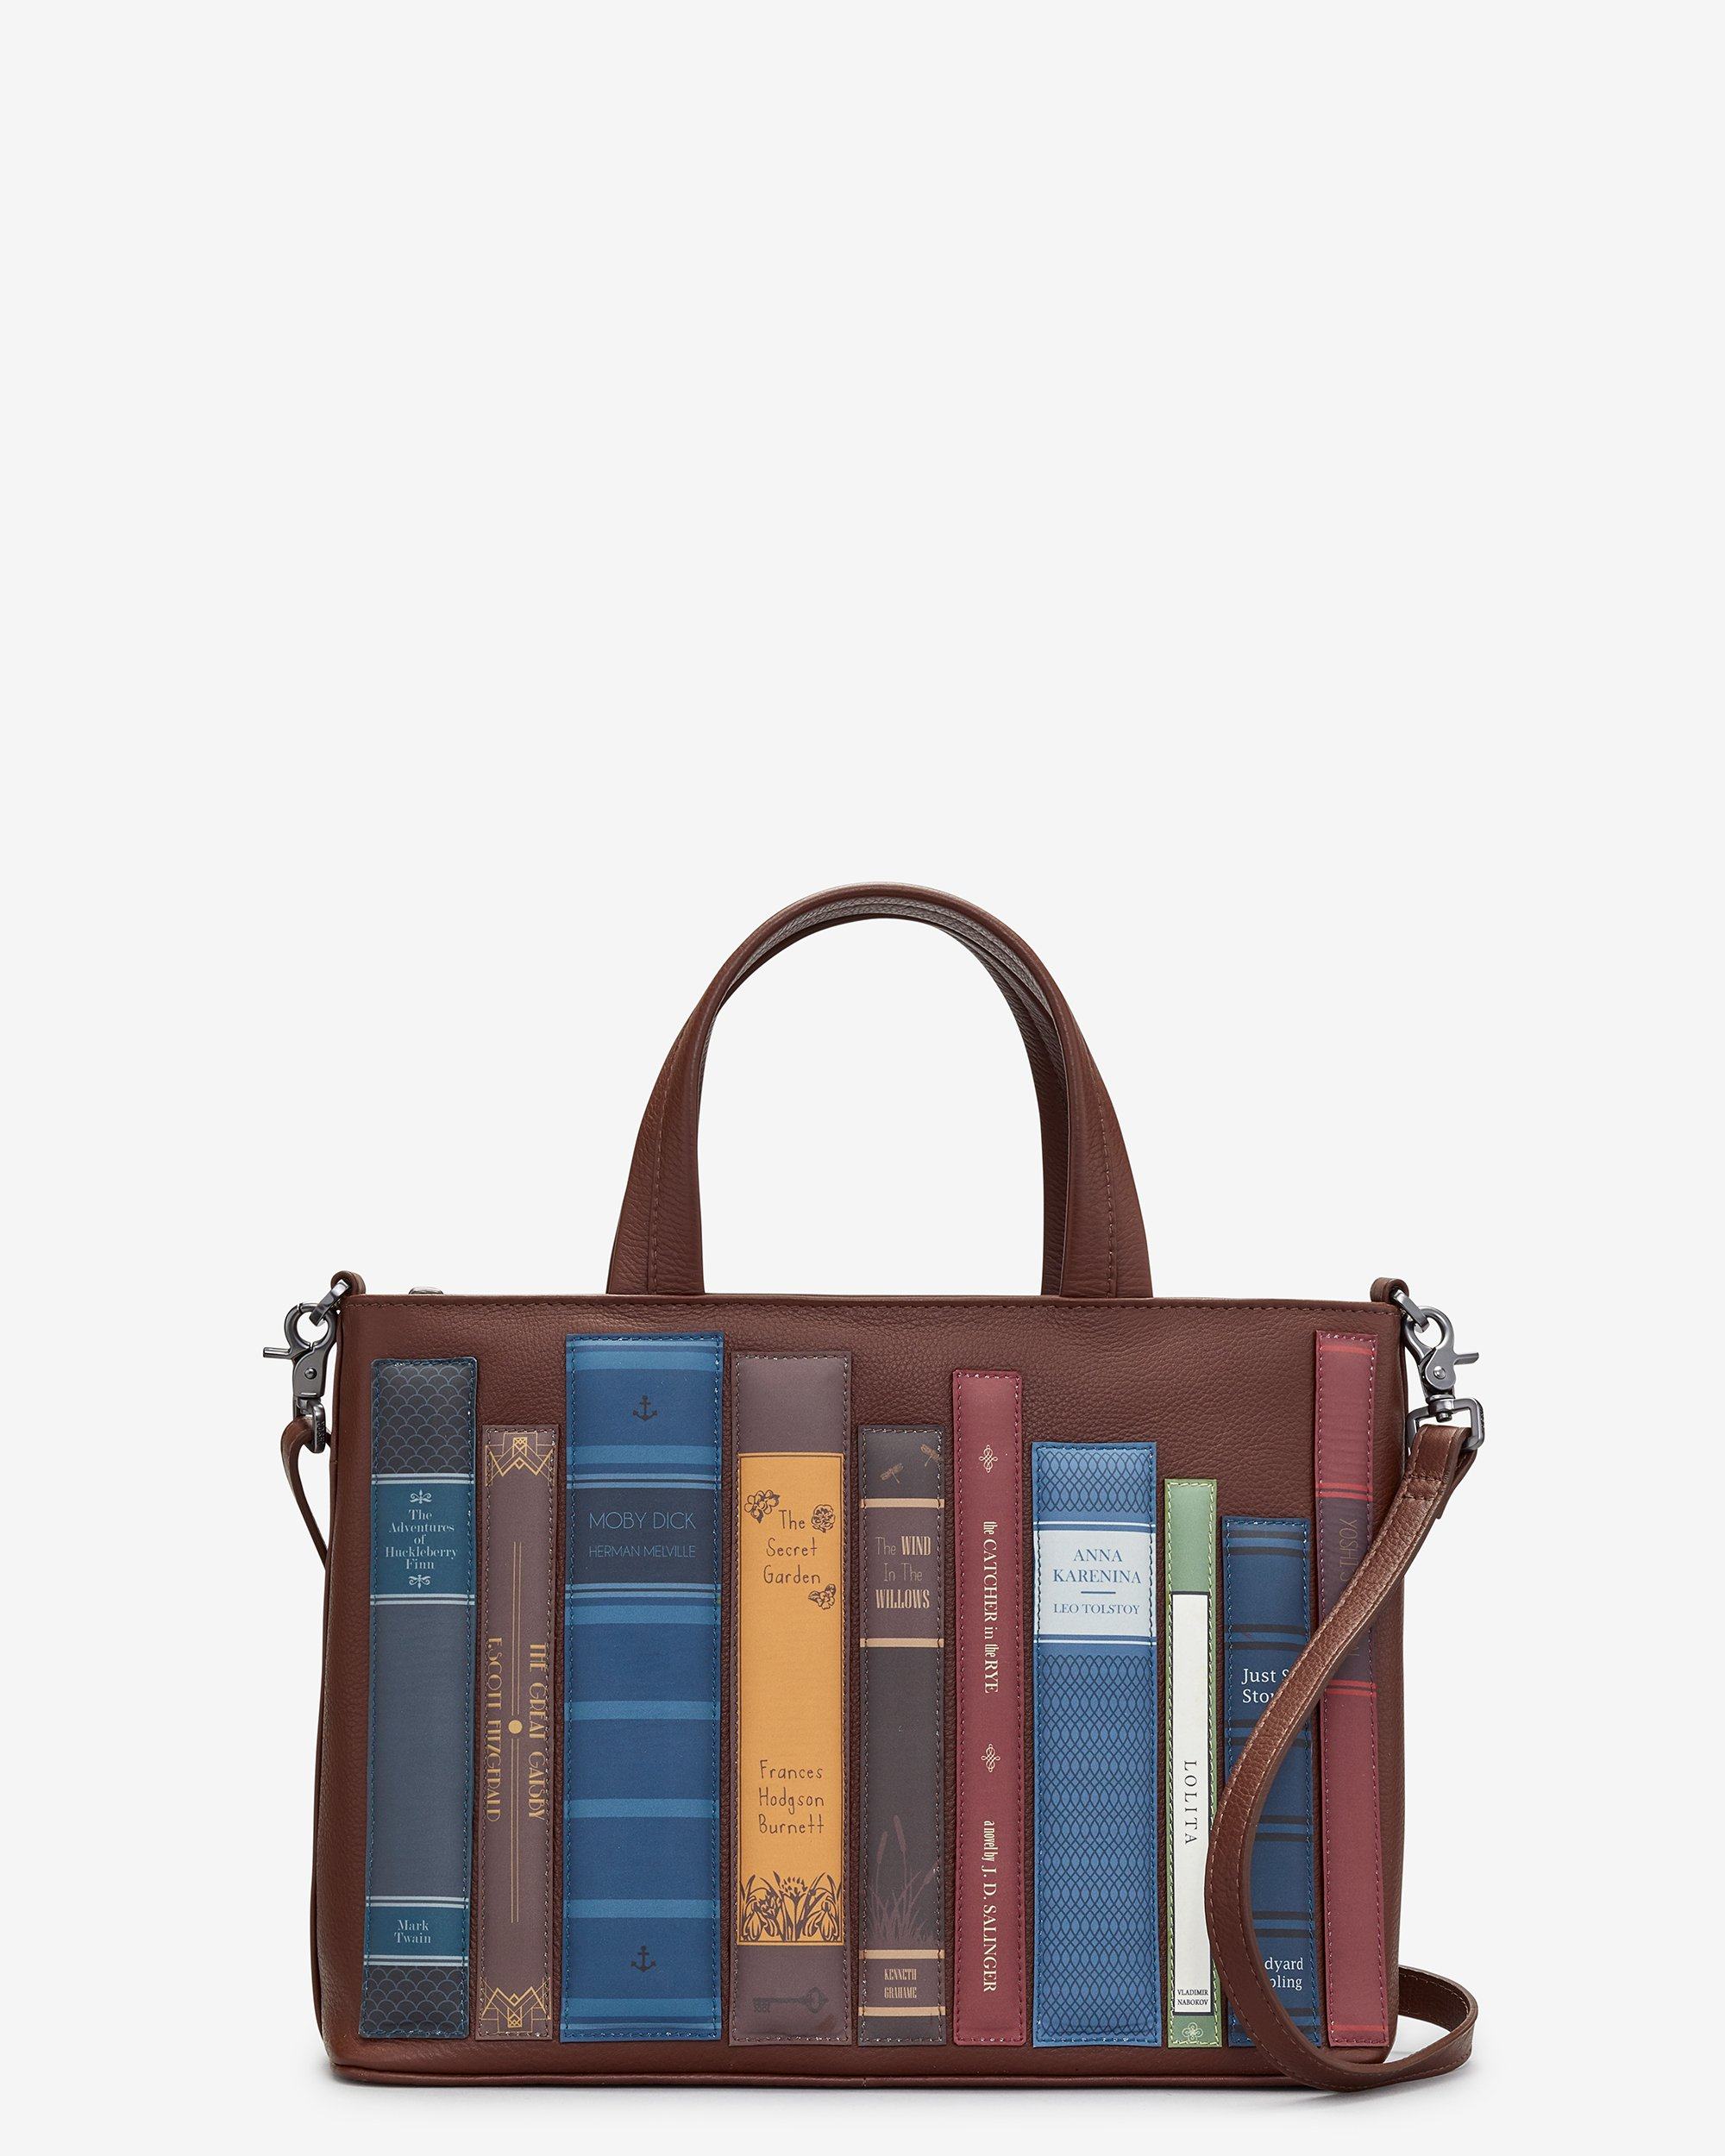 BOOKWORM BROWN LEATHER MULTIWAY GRAB BAG